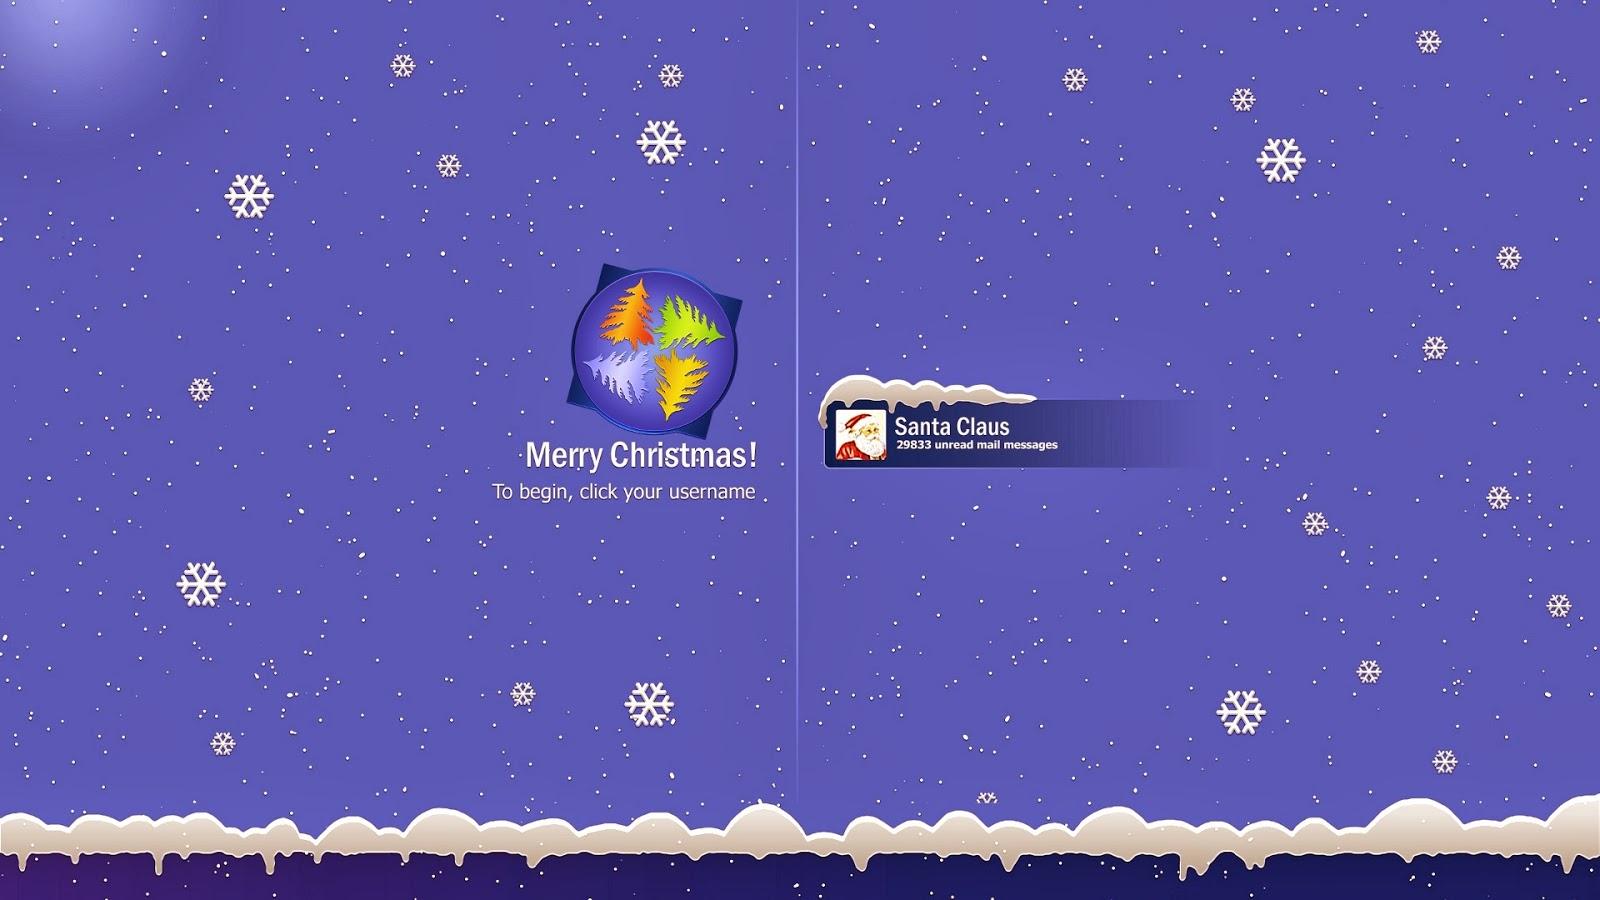 Free Wallpapers For Desktop 1920x1080 Hdtv 1080p Christmas